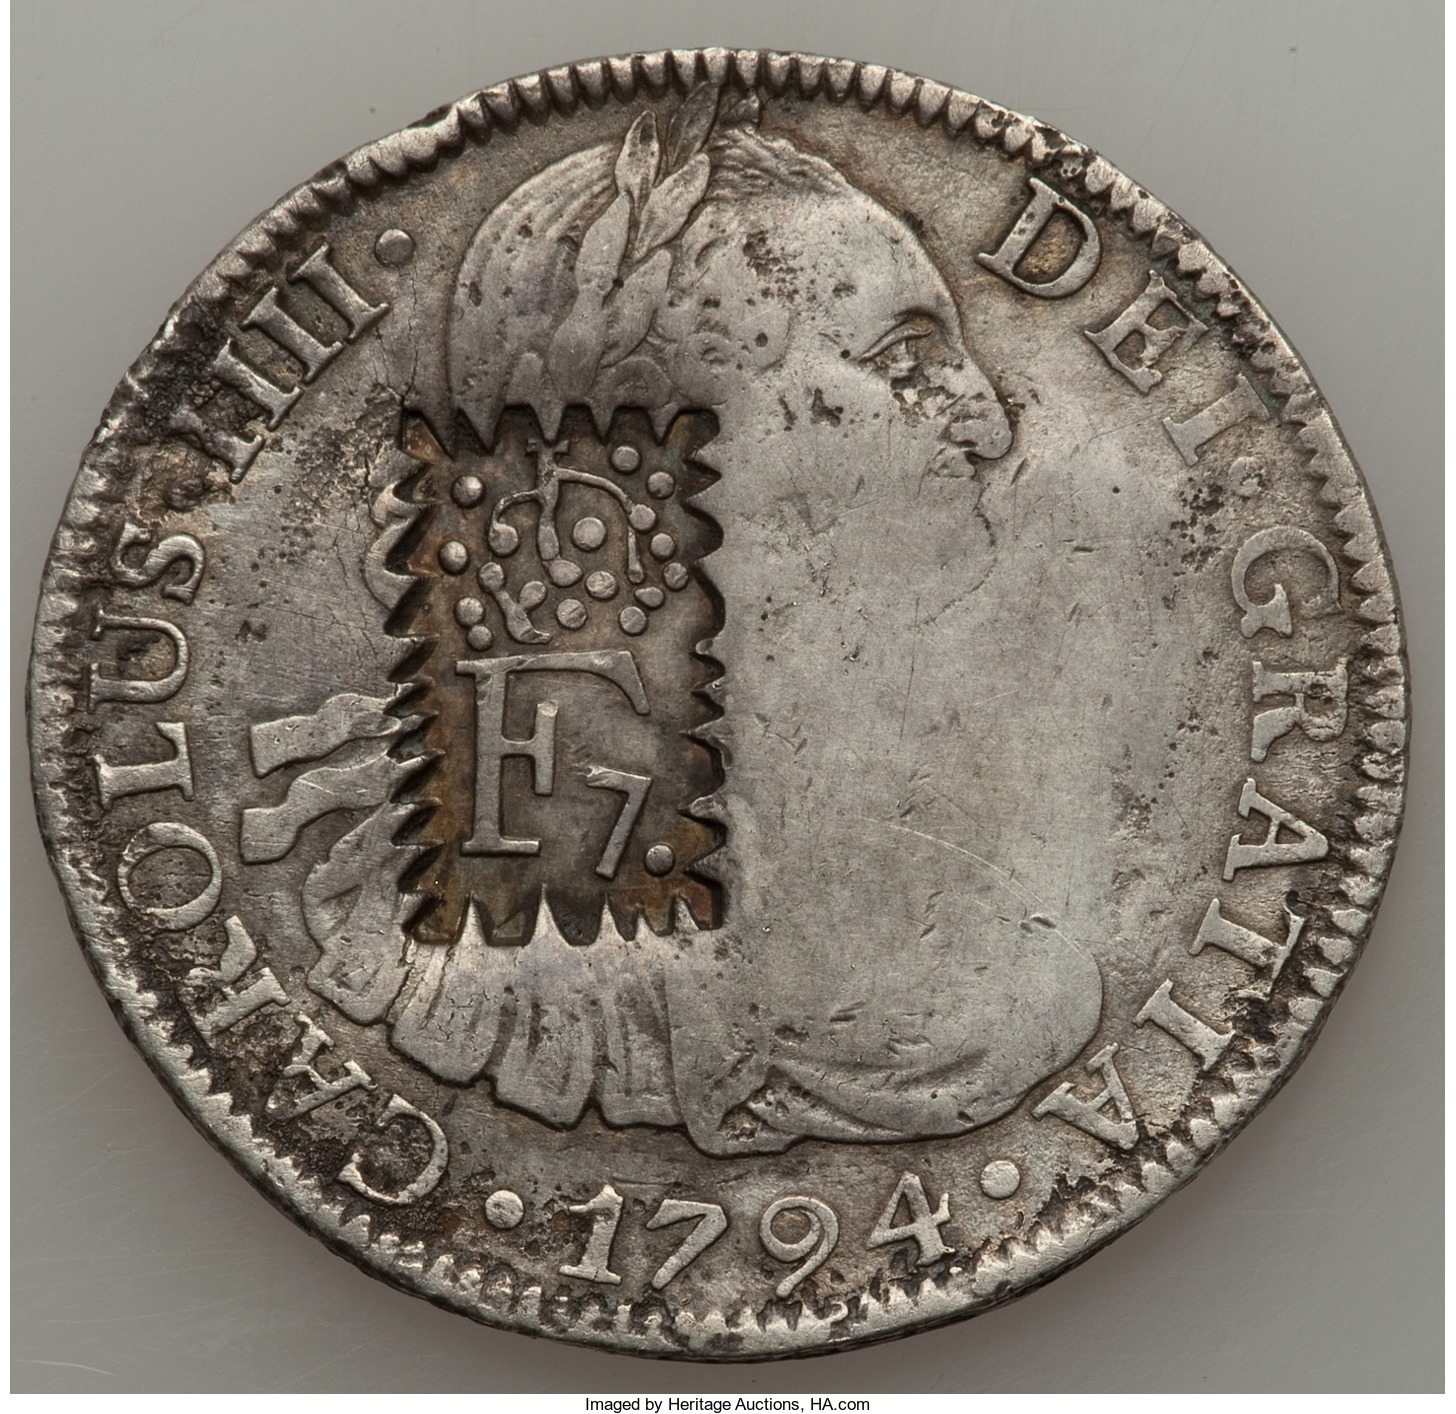 8 reales mexico 1794. Resello contramarca F 7 de fantasia